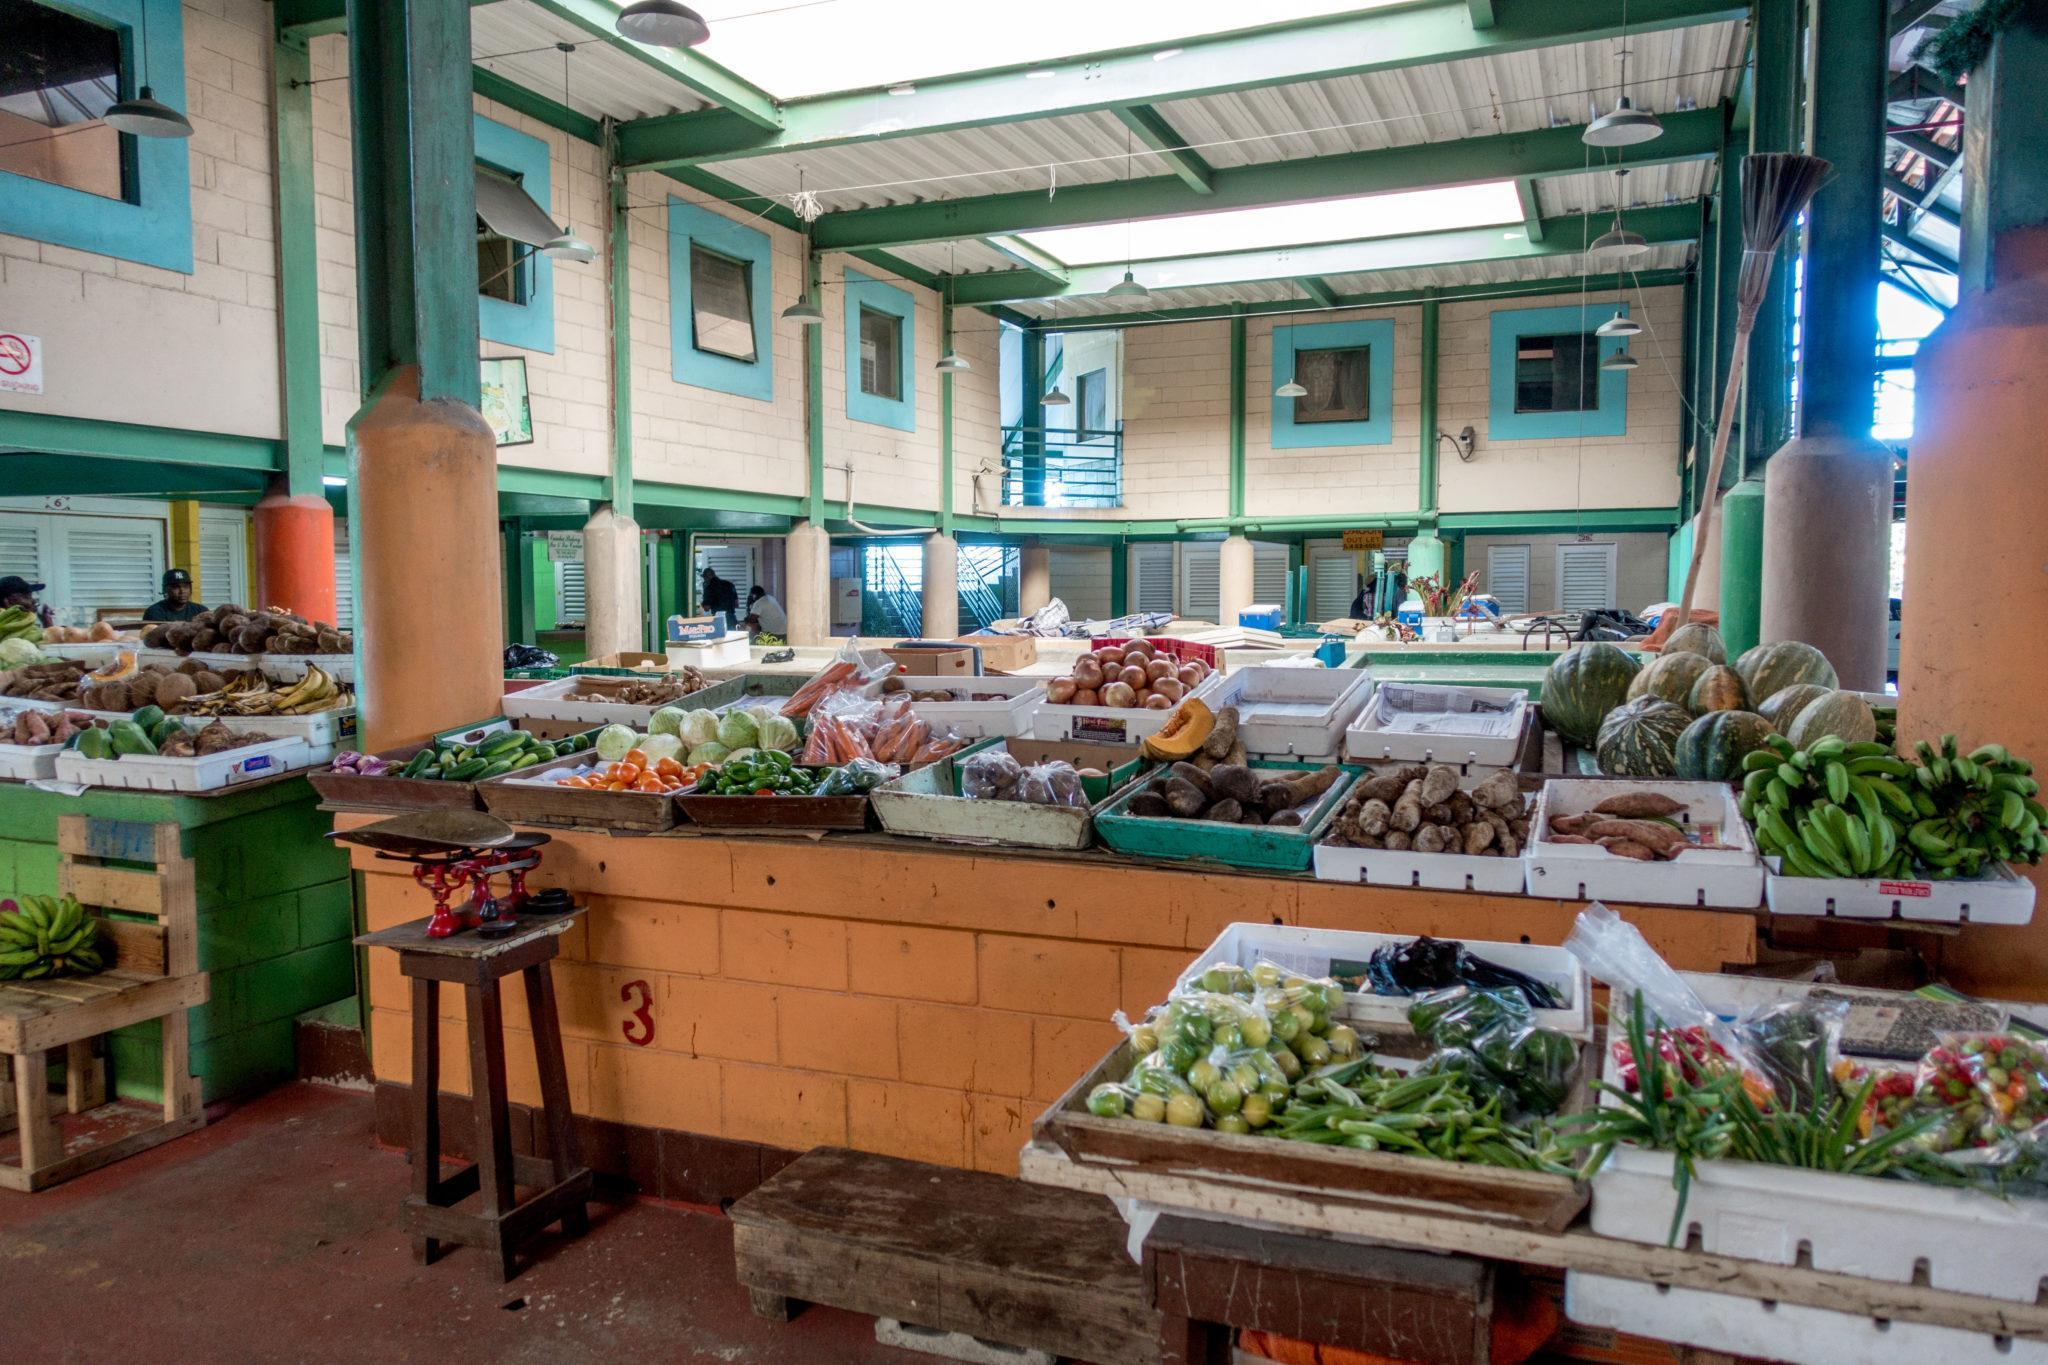 Vegetables for sale in St. John's Market